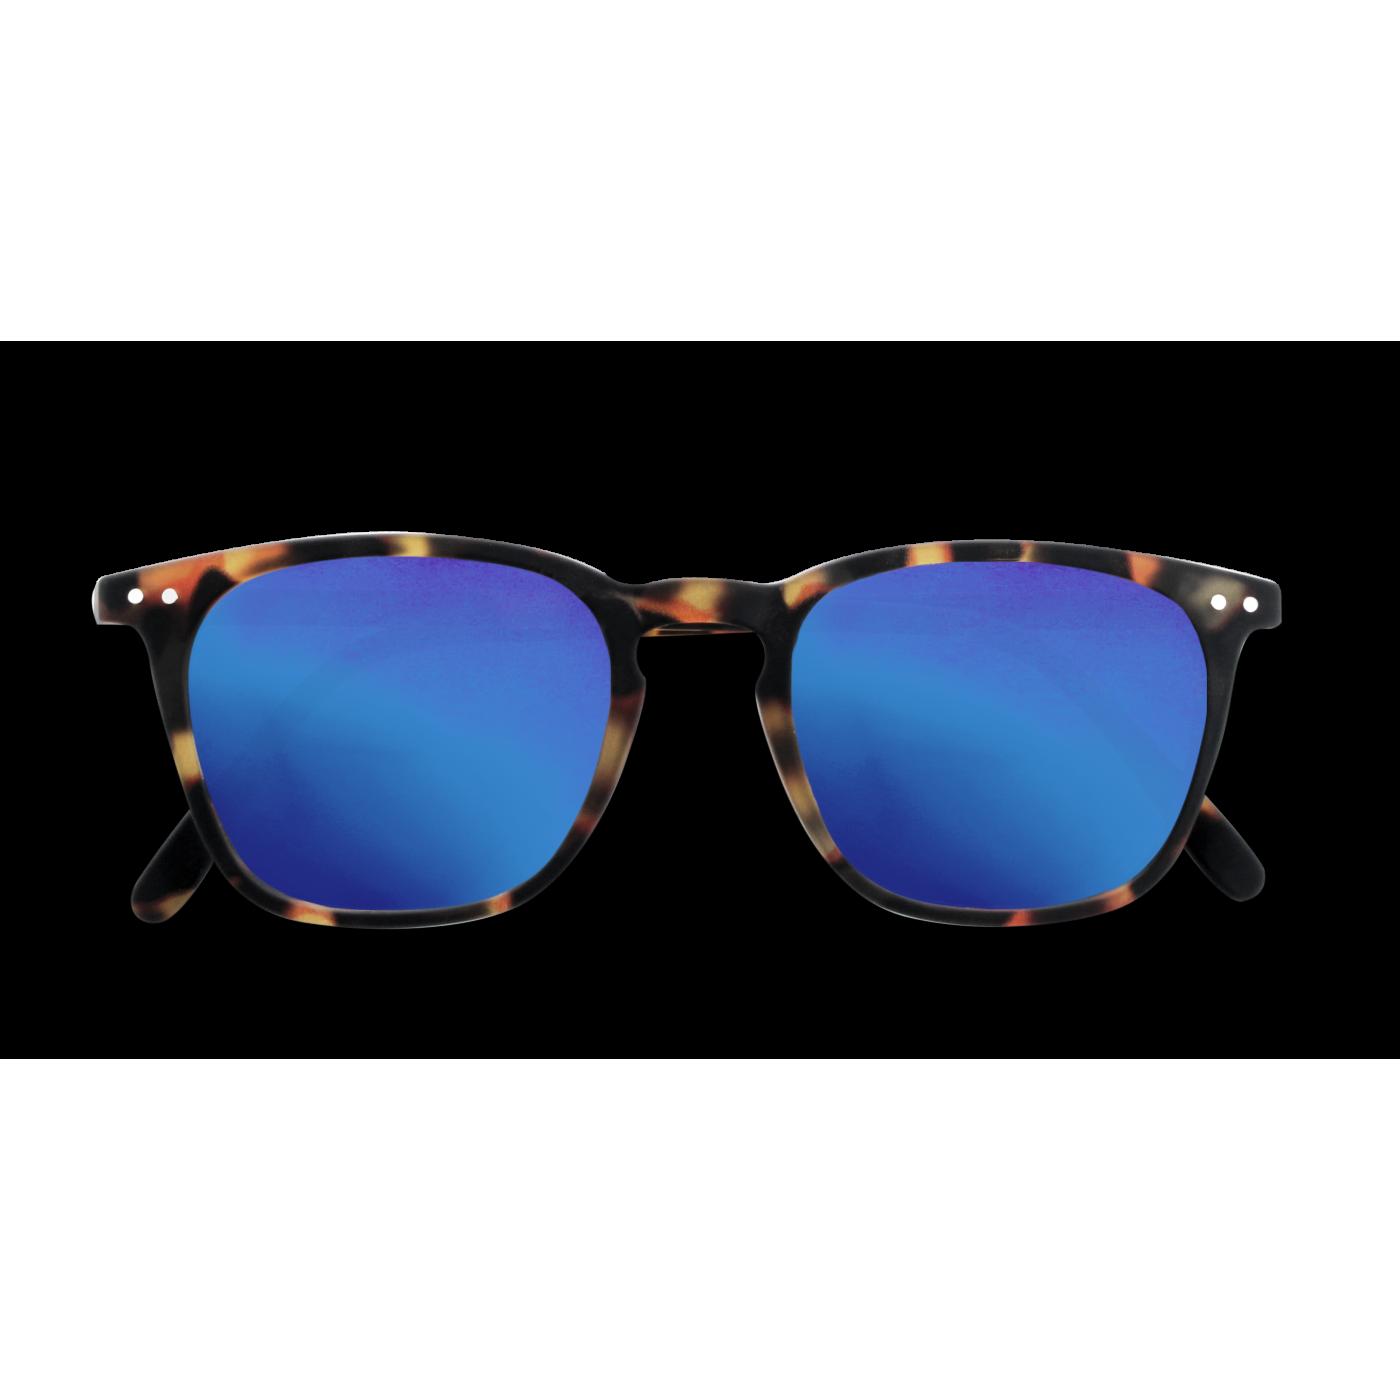 4ce1138927 Izipizi (See Concept) Adult Mirror Sunglasses Tortoise Shape E